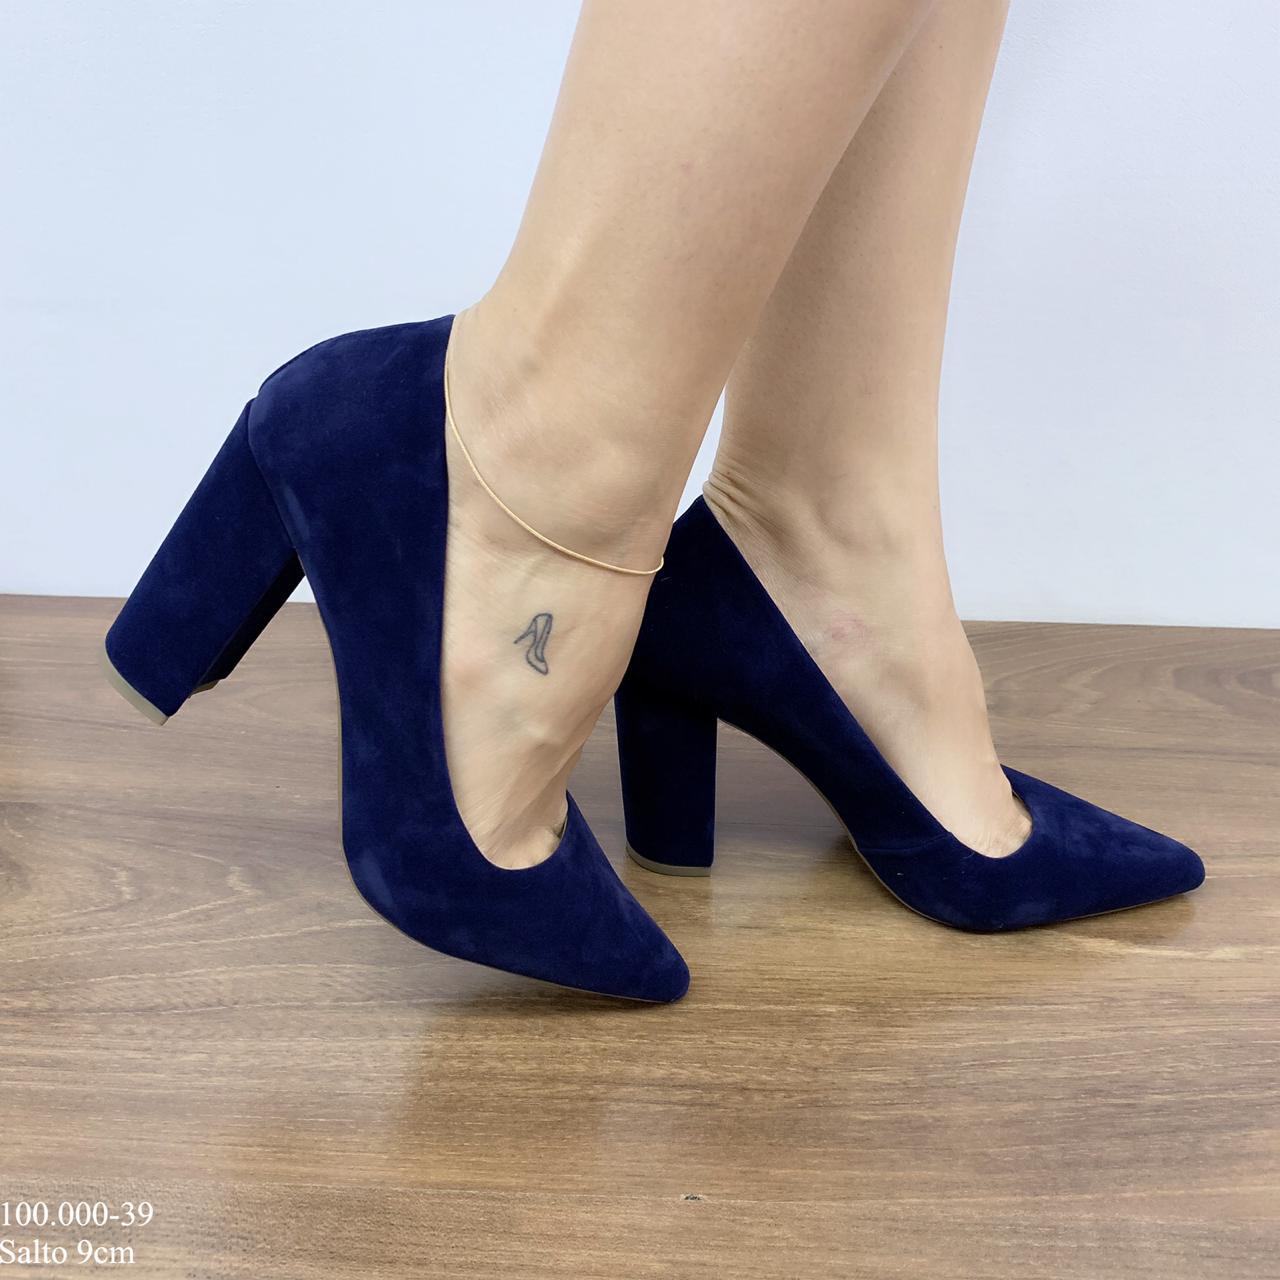 Sapato Scarpin Azul Marinho | D- 100.000-39